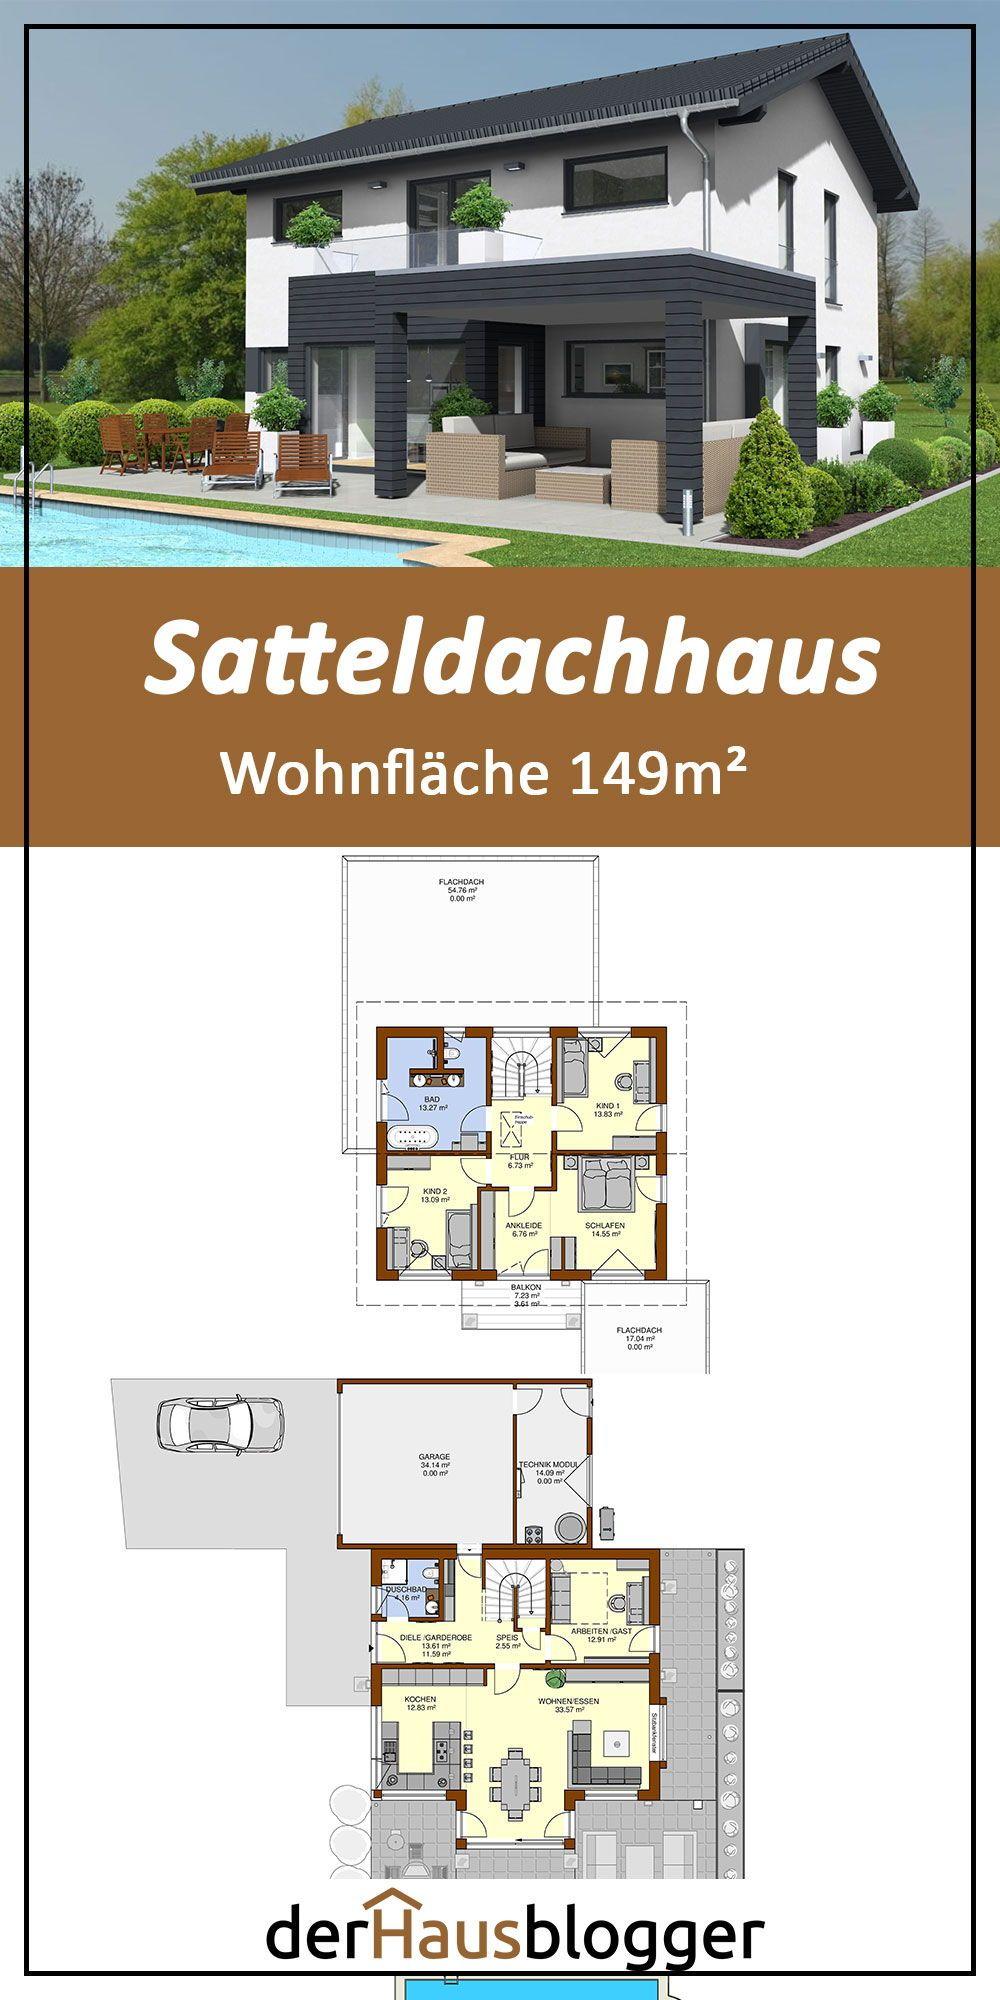 Satteldachhaus 149m² | derHausblogger